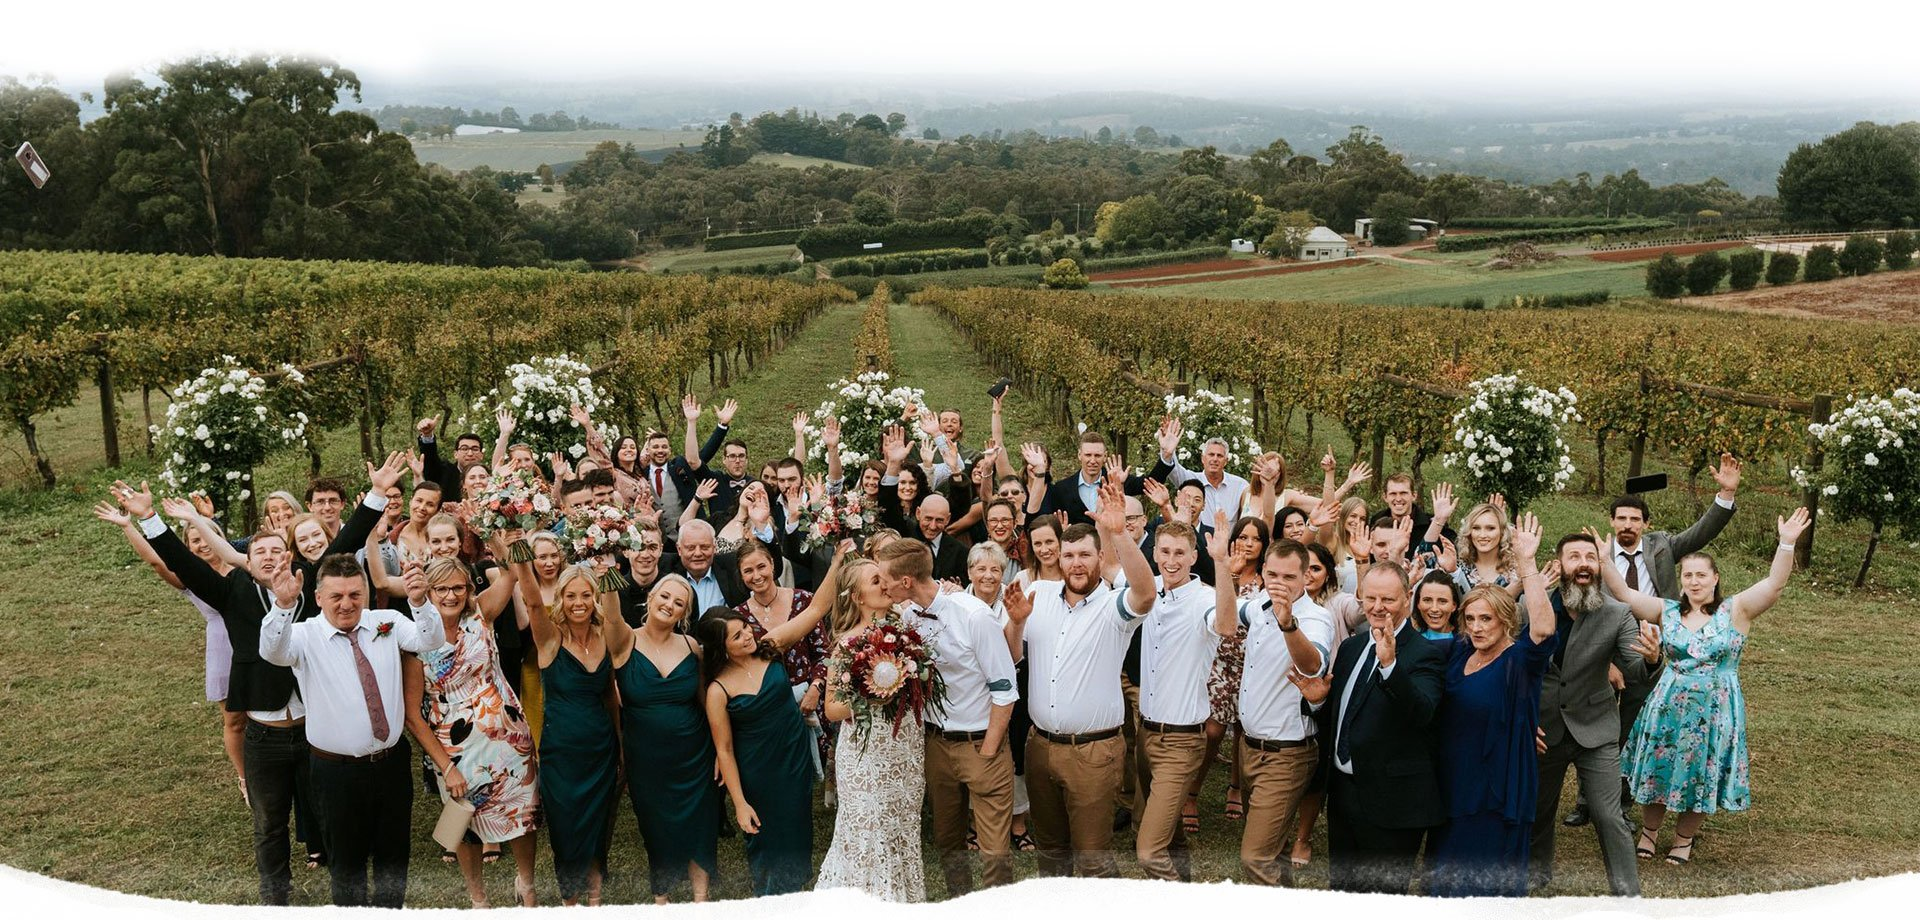 Elmswood Estate Winery | Yarra Valley Winery | Yarra Valley Wedding Venue